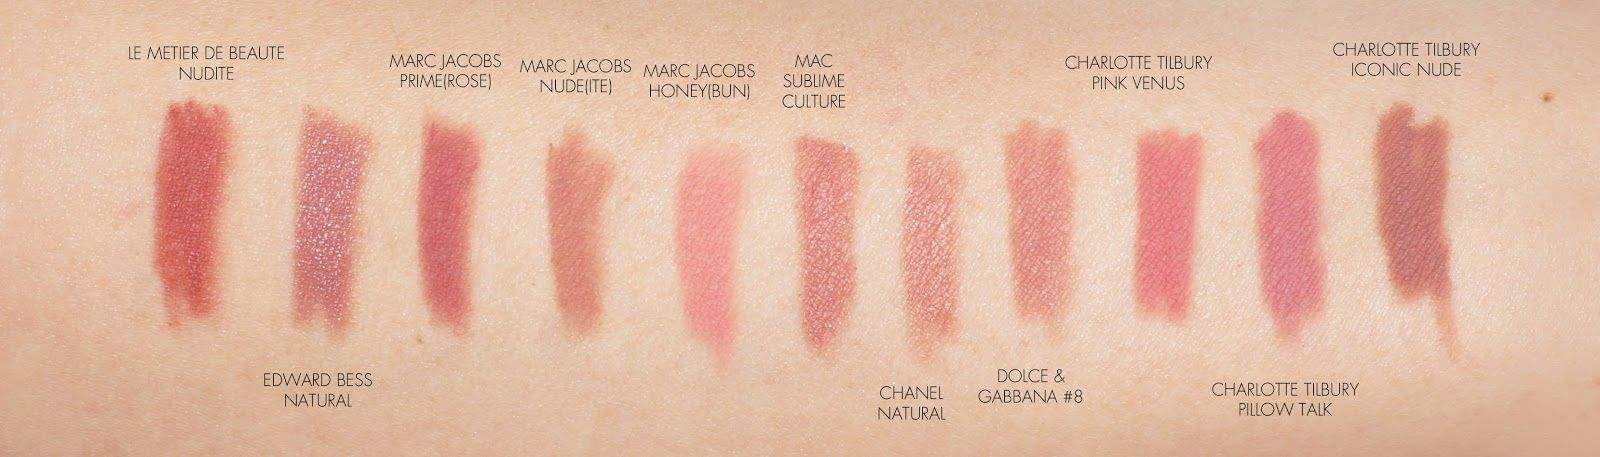 Poutliner Longwear Lip Liner Pencil by Marc Jacobs Beauty #7